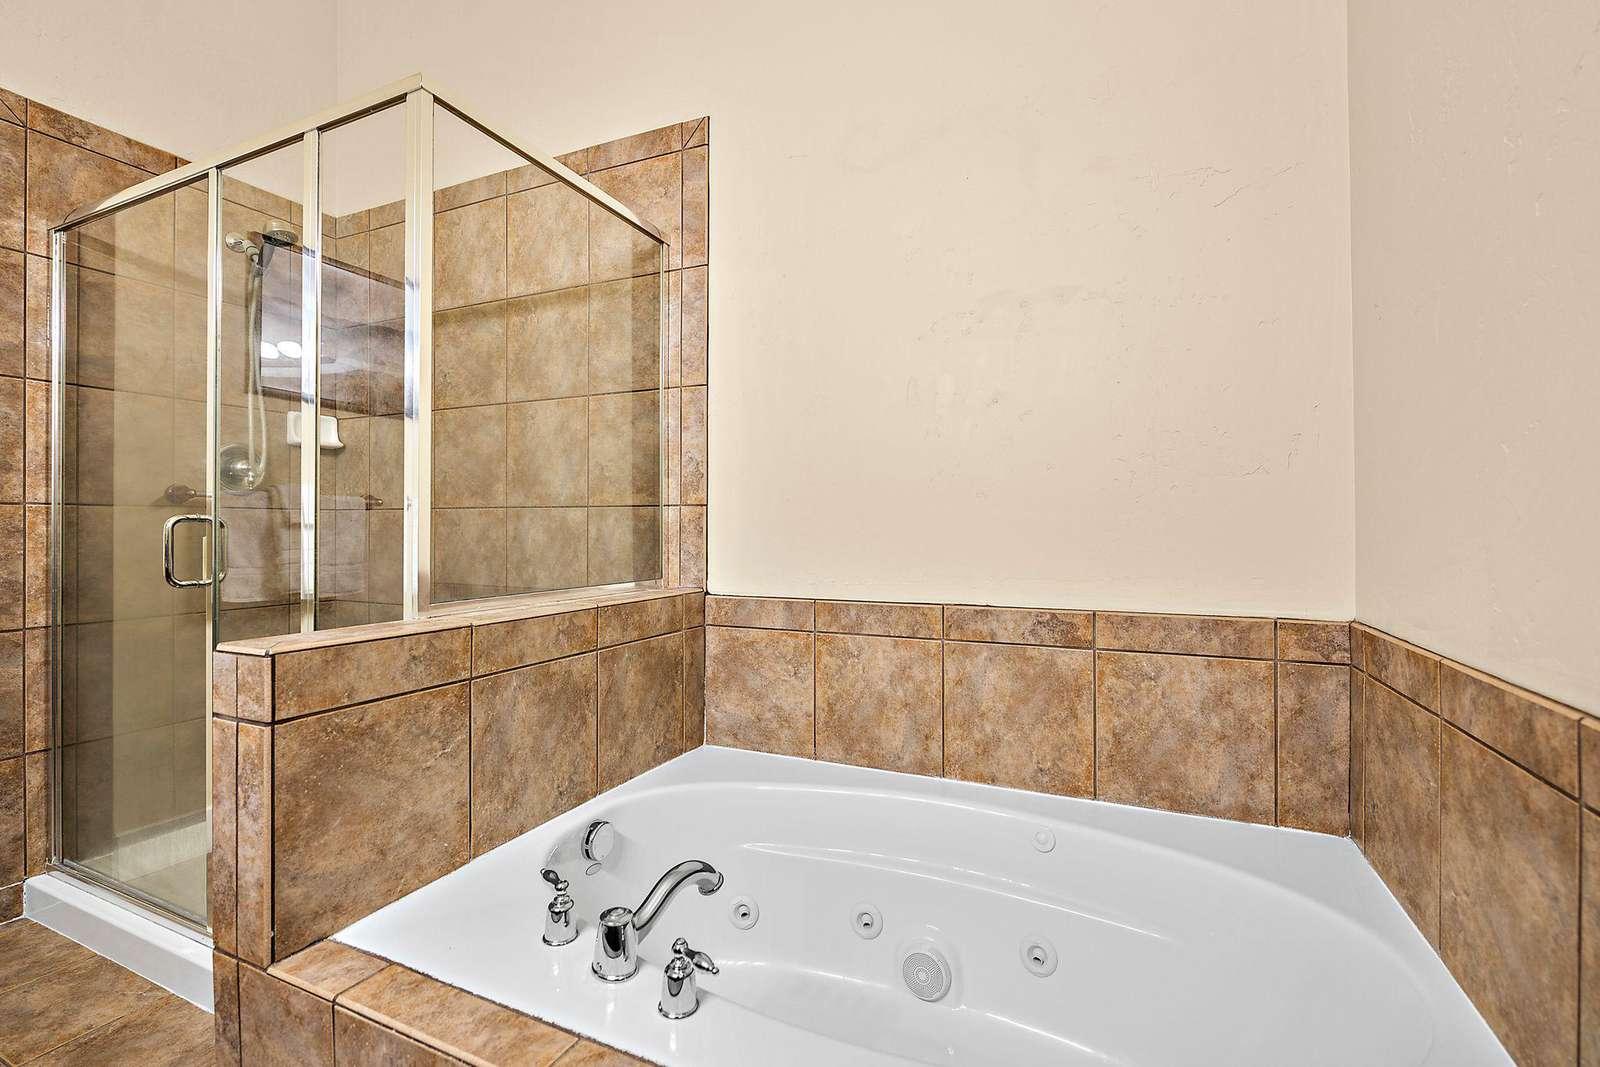 En-suite bathroom with standing shower and bathtub